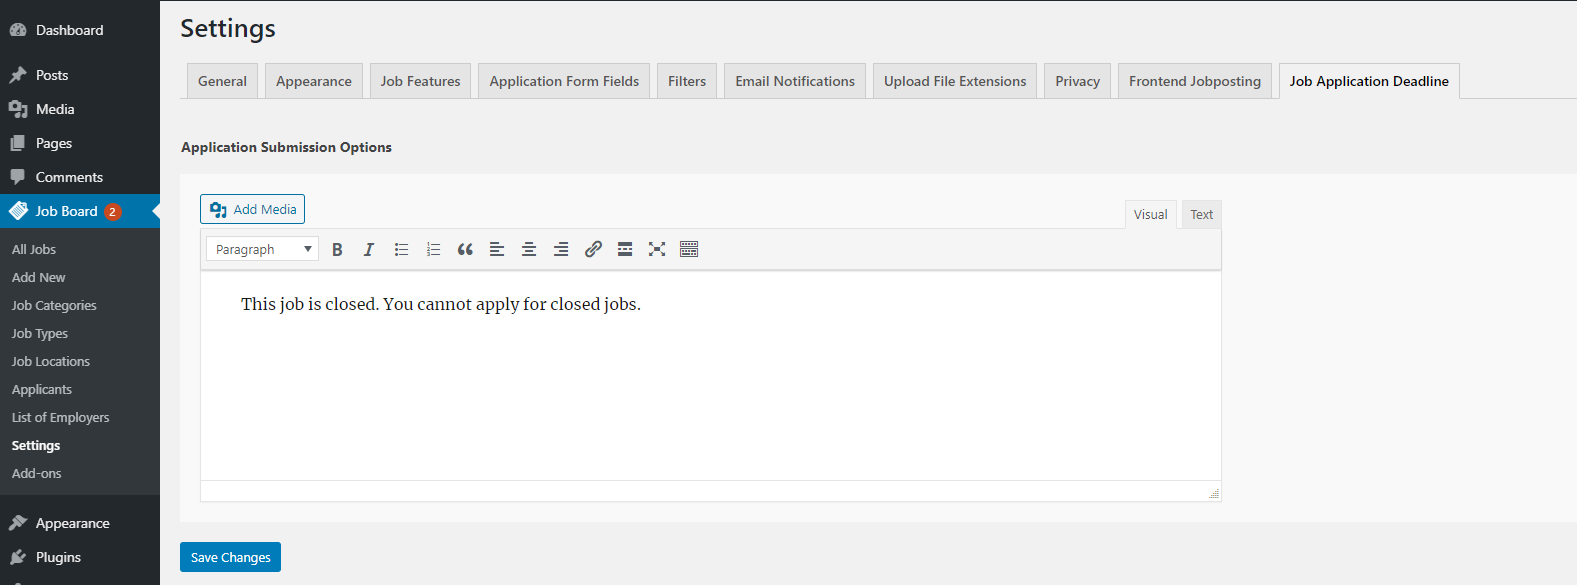 SJB-JobApplicationDeadline-SS6